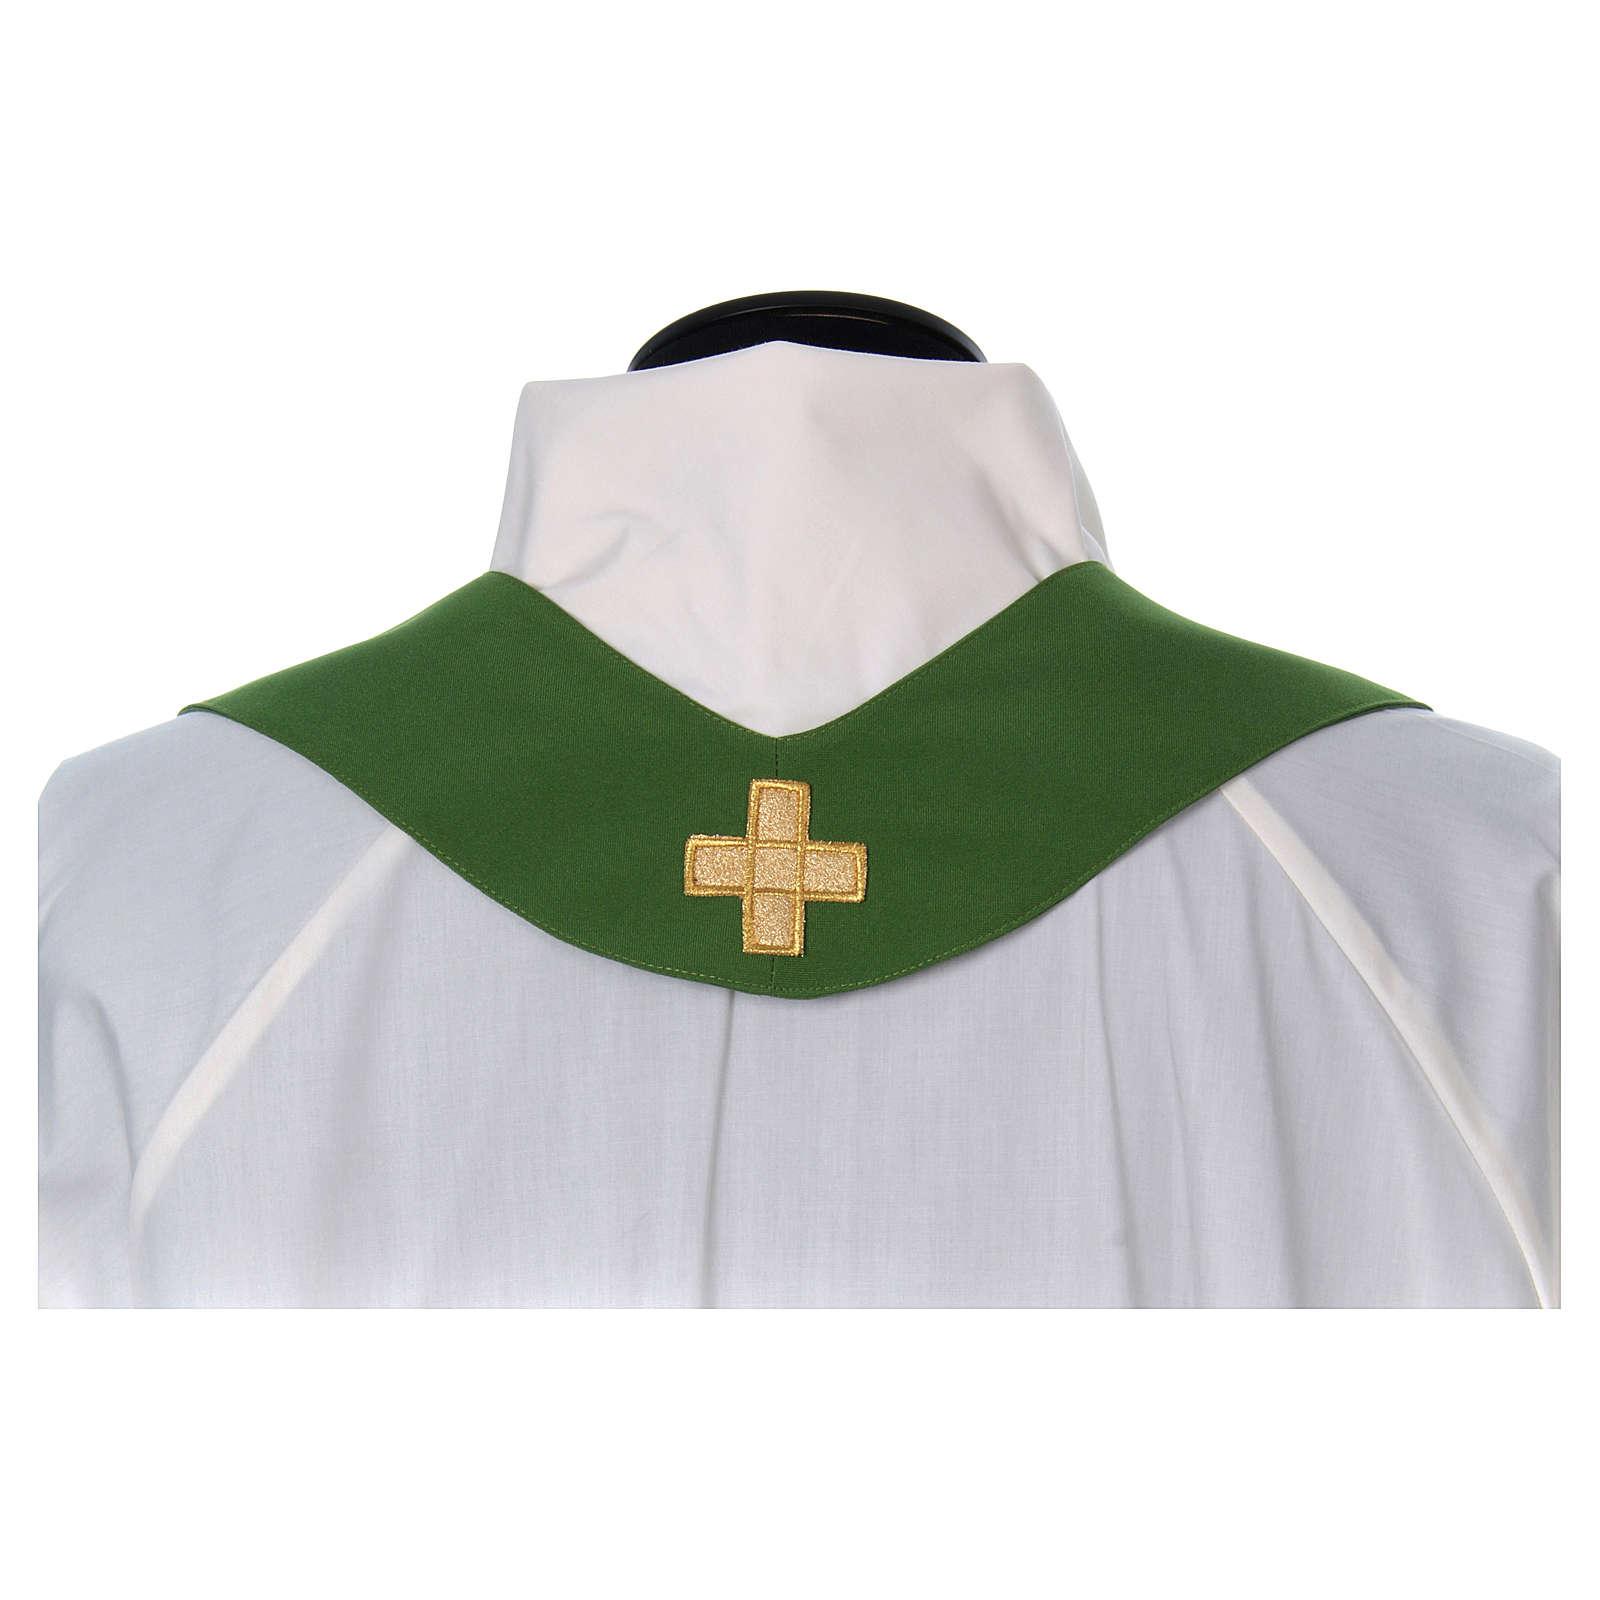 Casula bordado cruz 4 cores 4